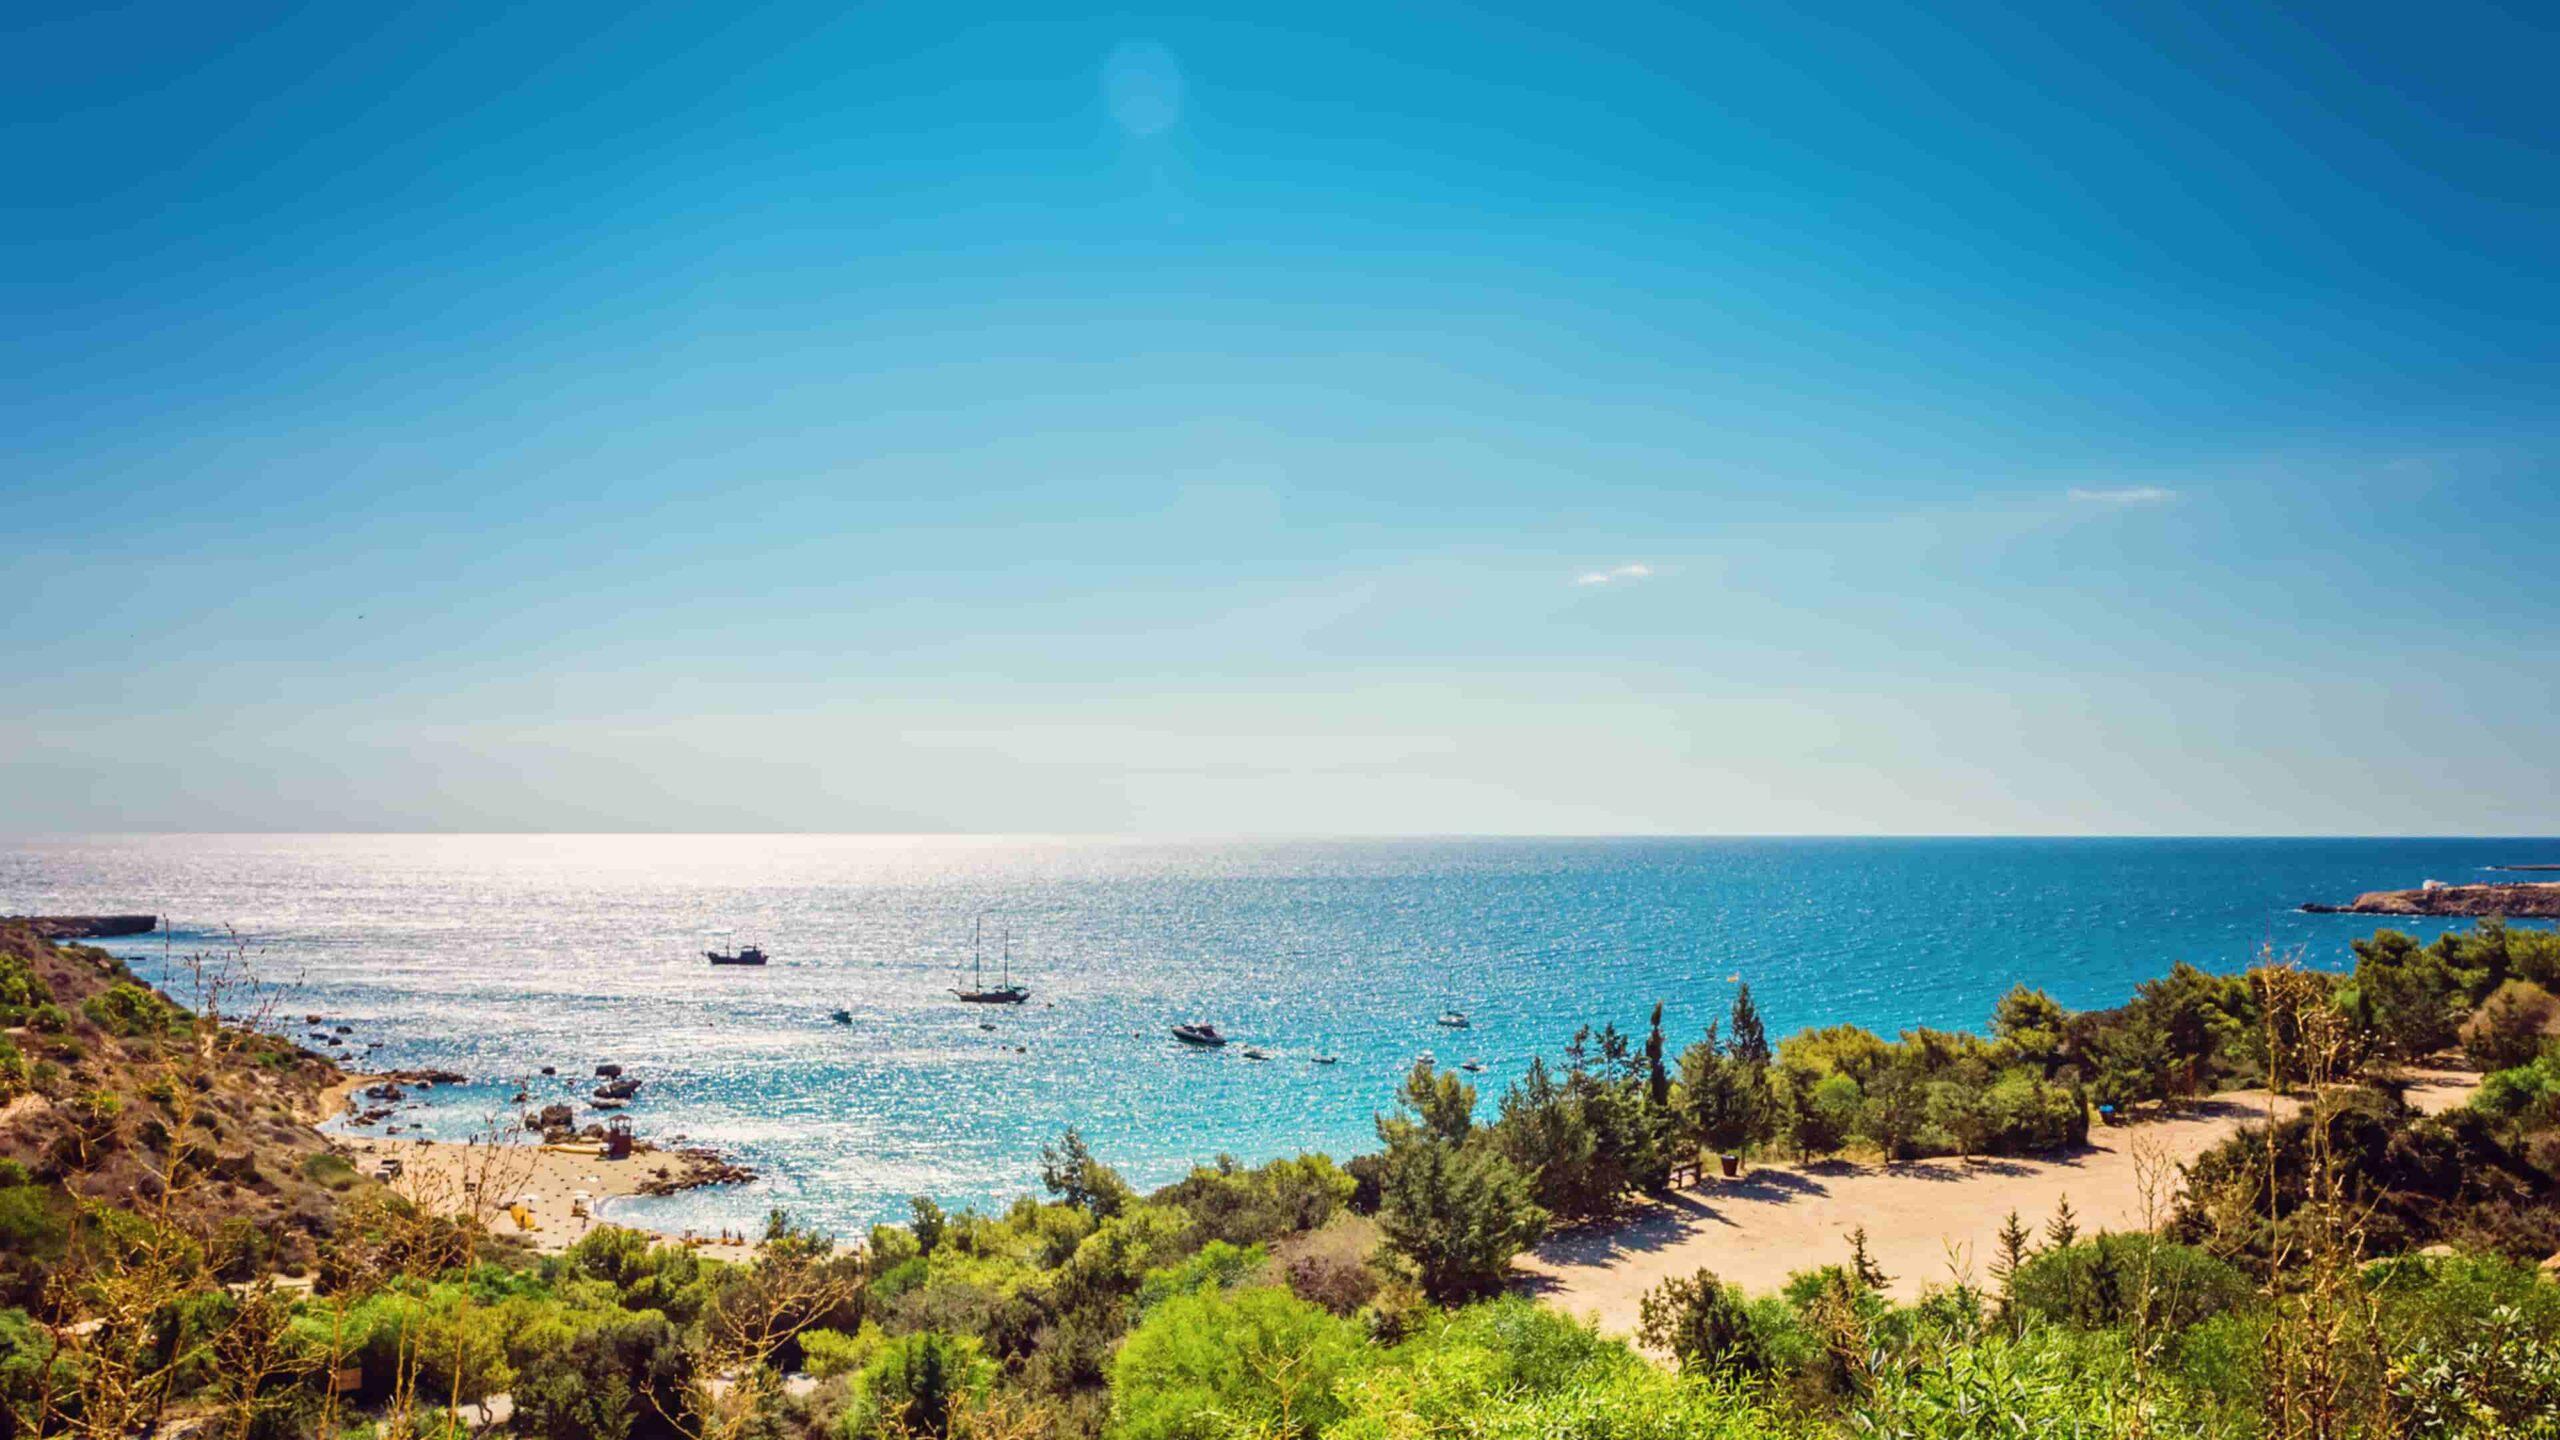 Cyprus Konnos Bay